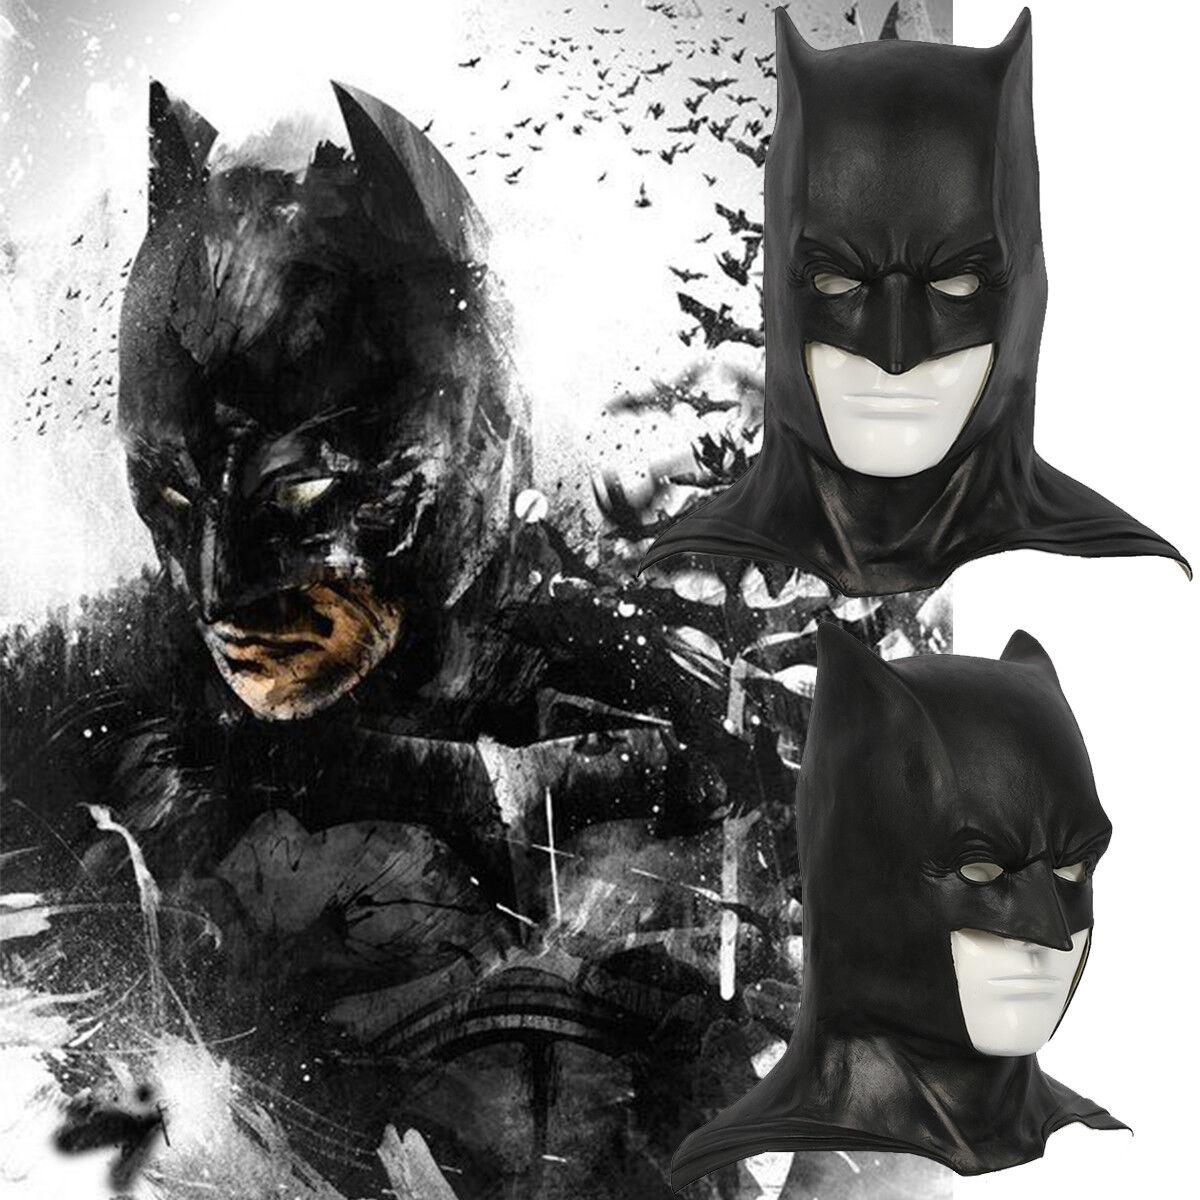 Batman Joker Mask Adult Full Overhead Resin Mask for Cosplay Show Costume Party